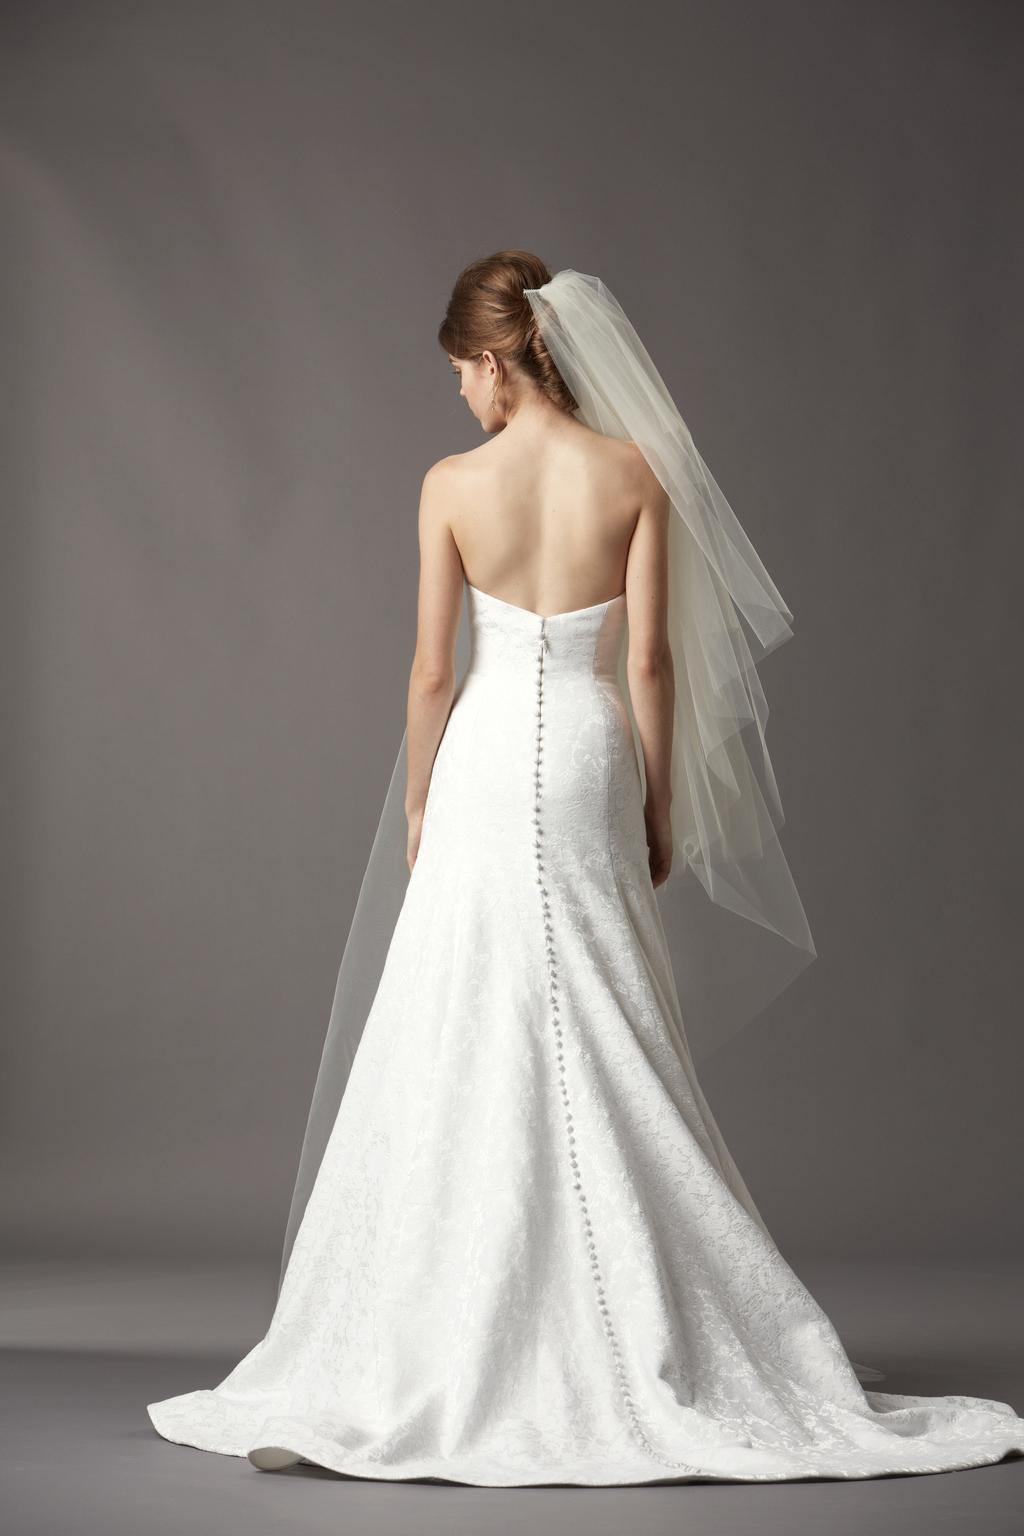 Watters-bridal-gowns-fall-2013-wedding-dress-4048b-a.full